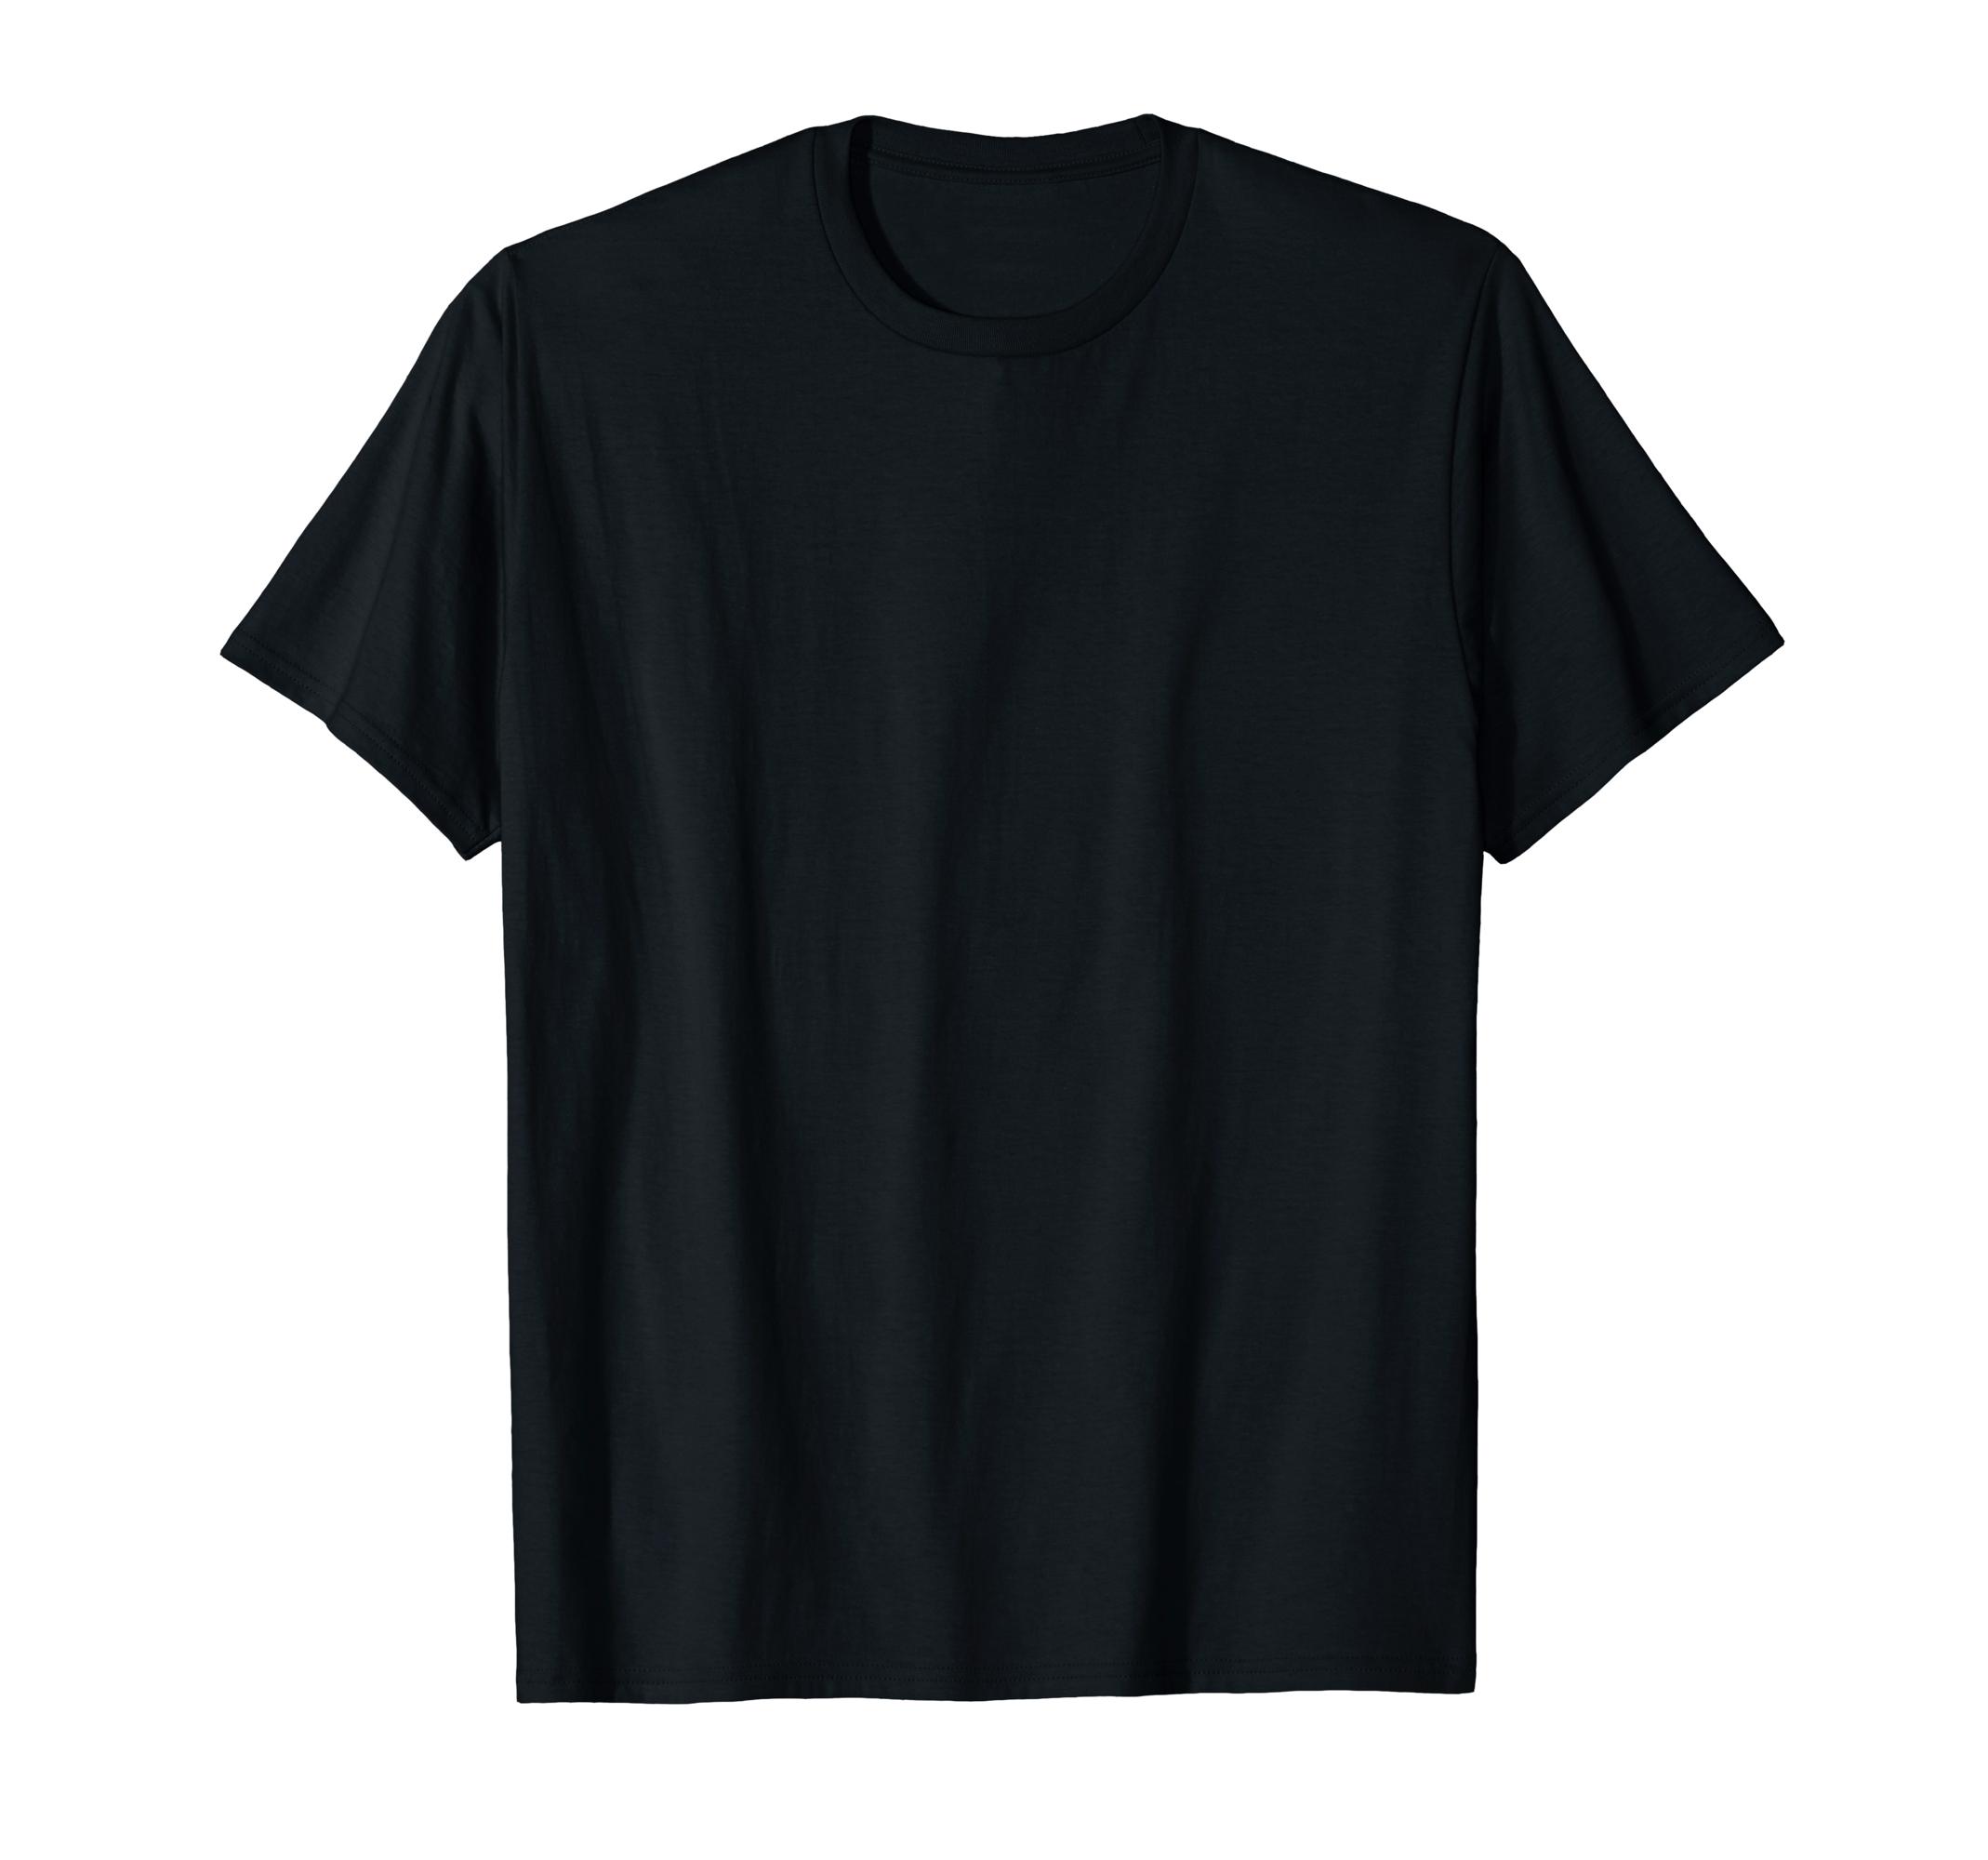 Black//White//Red//Gray Legend Aston-Martin Car Logo Cute Funny Classic T-Shirt for Boys Girls